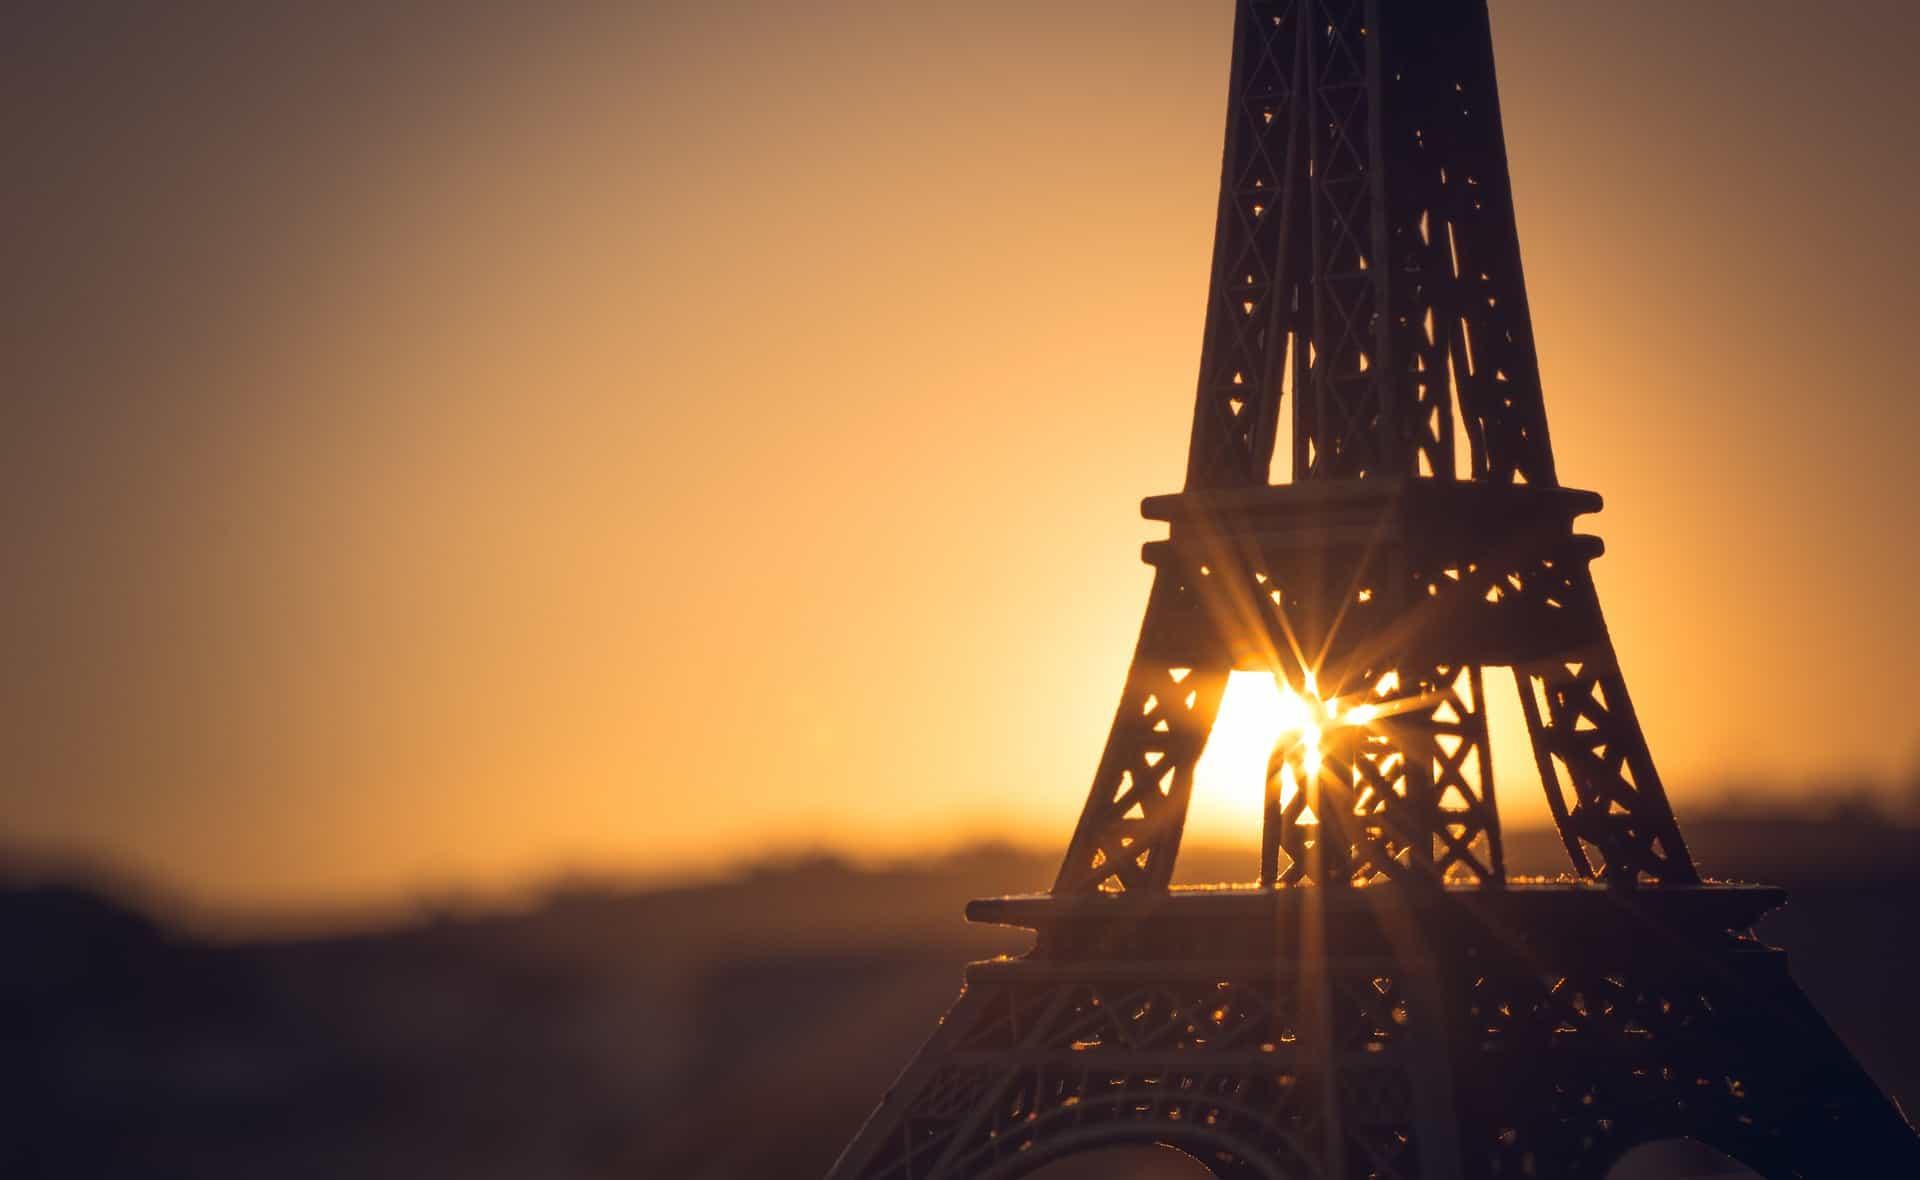 Historia de la Torre Eiffel: La Joya de la corona turística de París